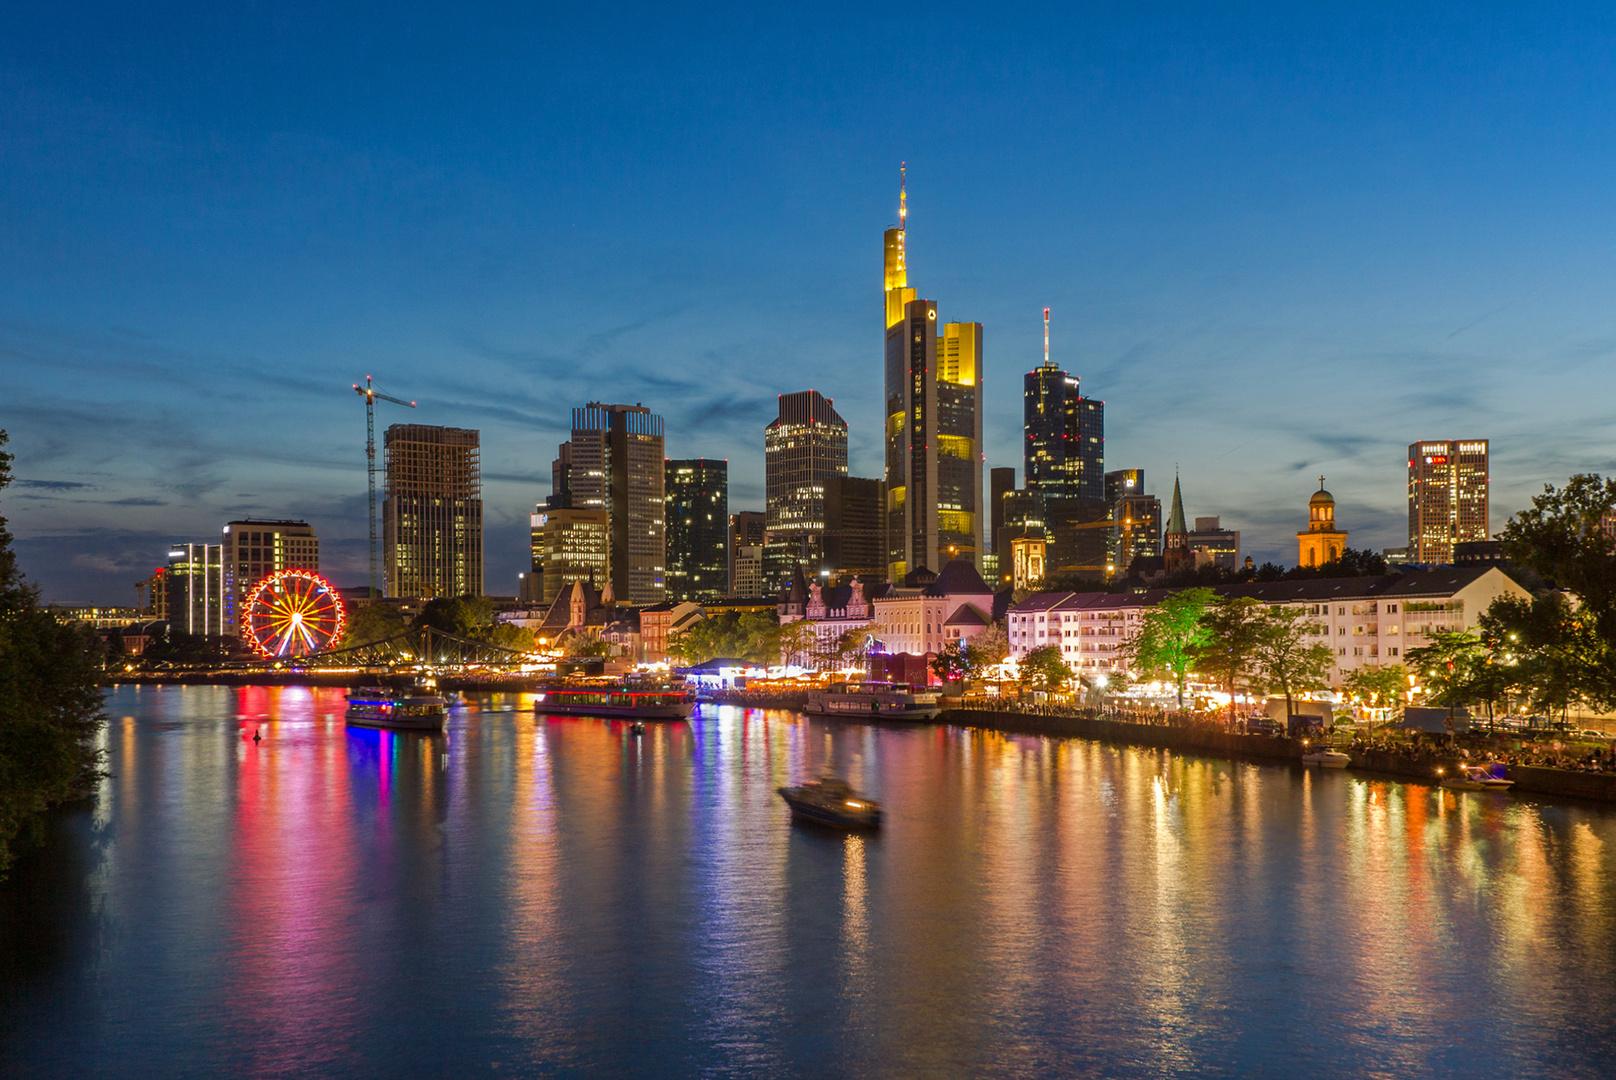 Frankfurt am Main beim Mainfest 2017 Foto & Bild